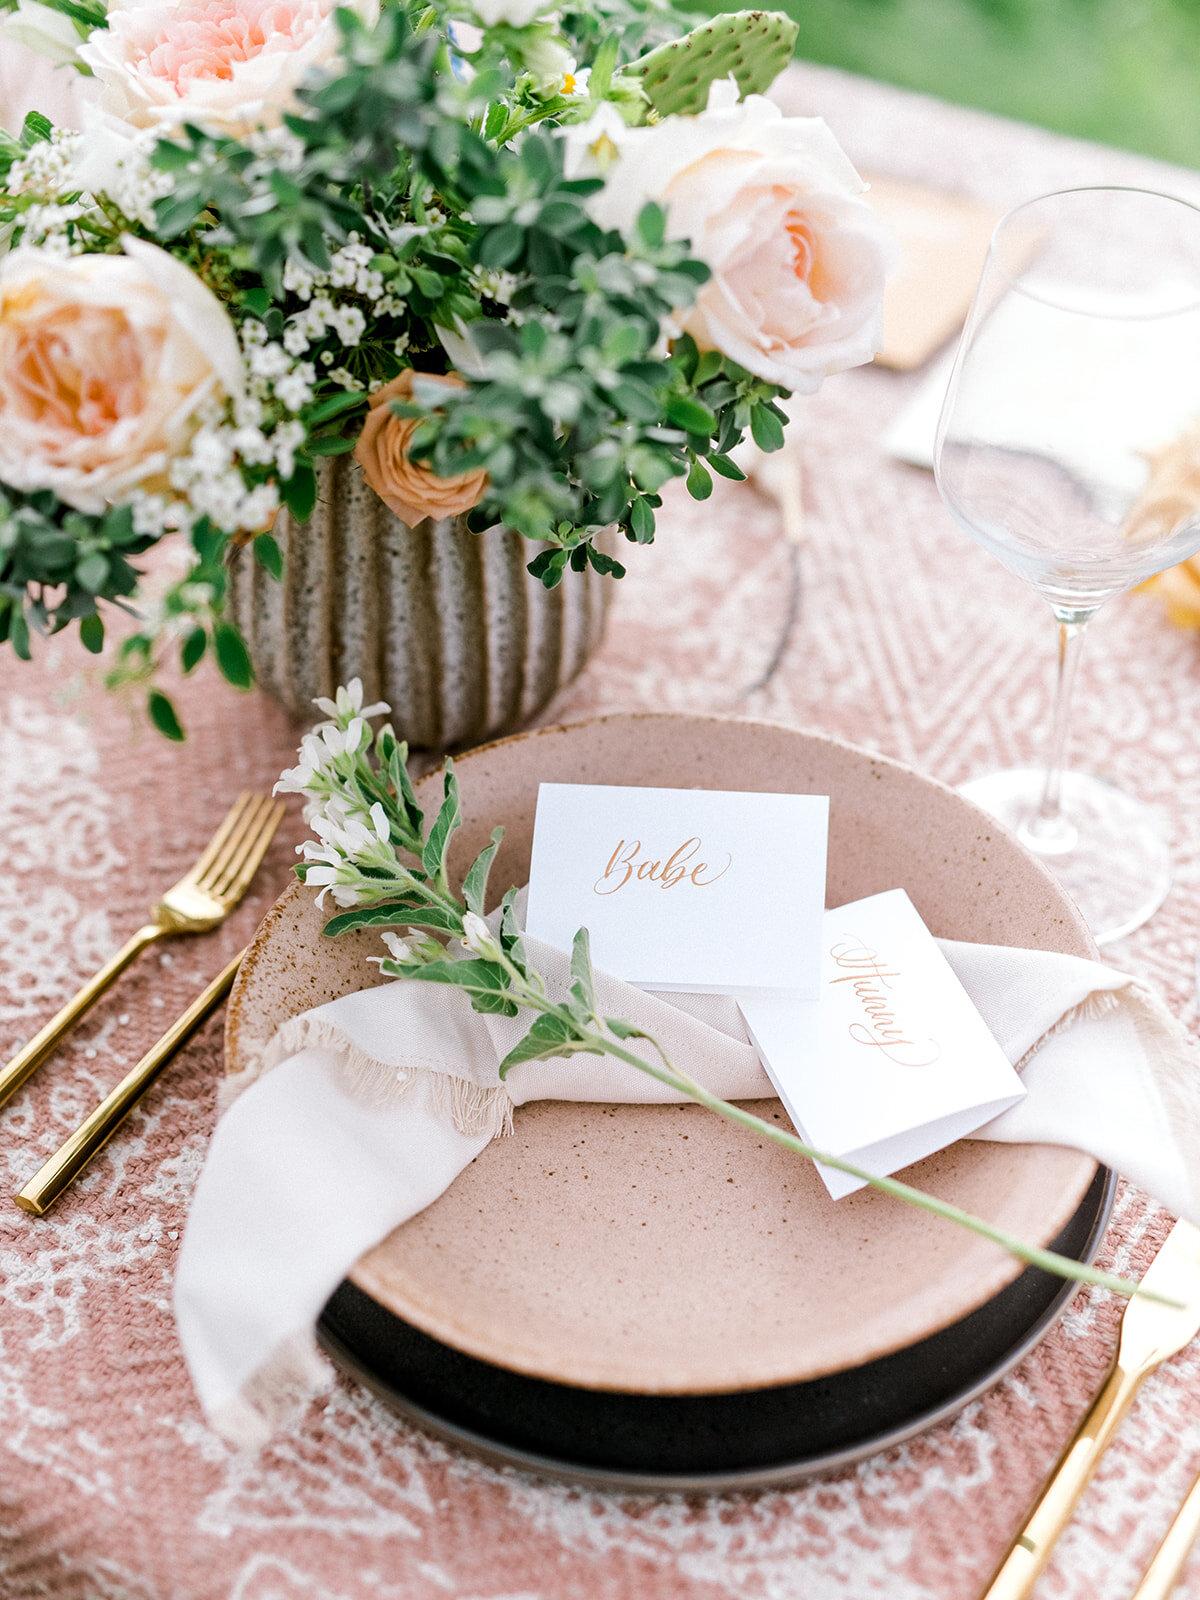 Elegant Country Wedding Table Setting